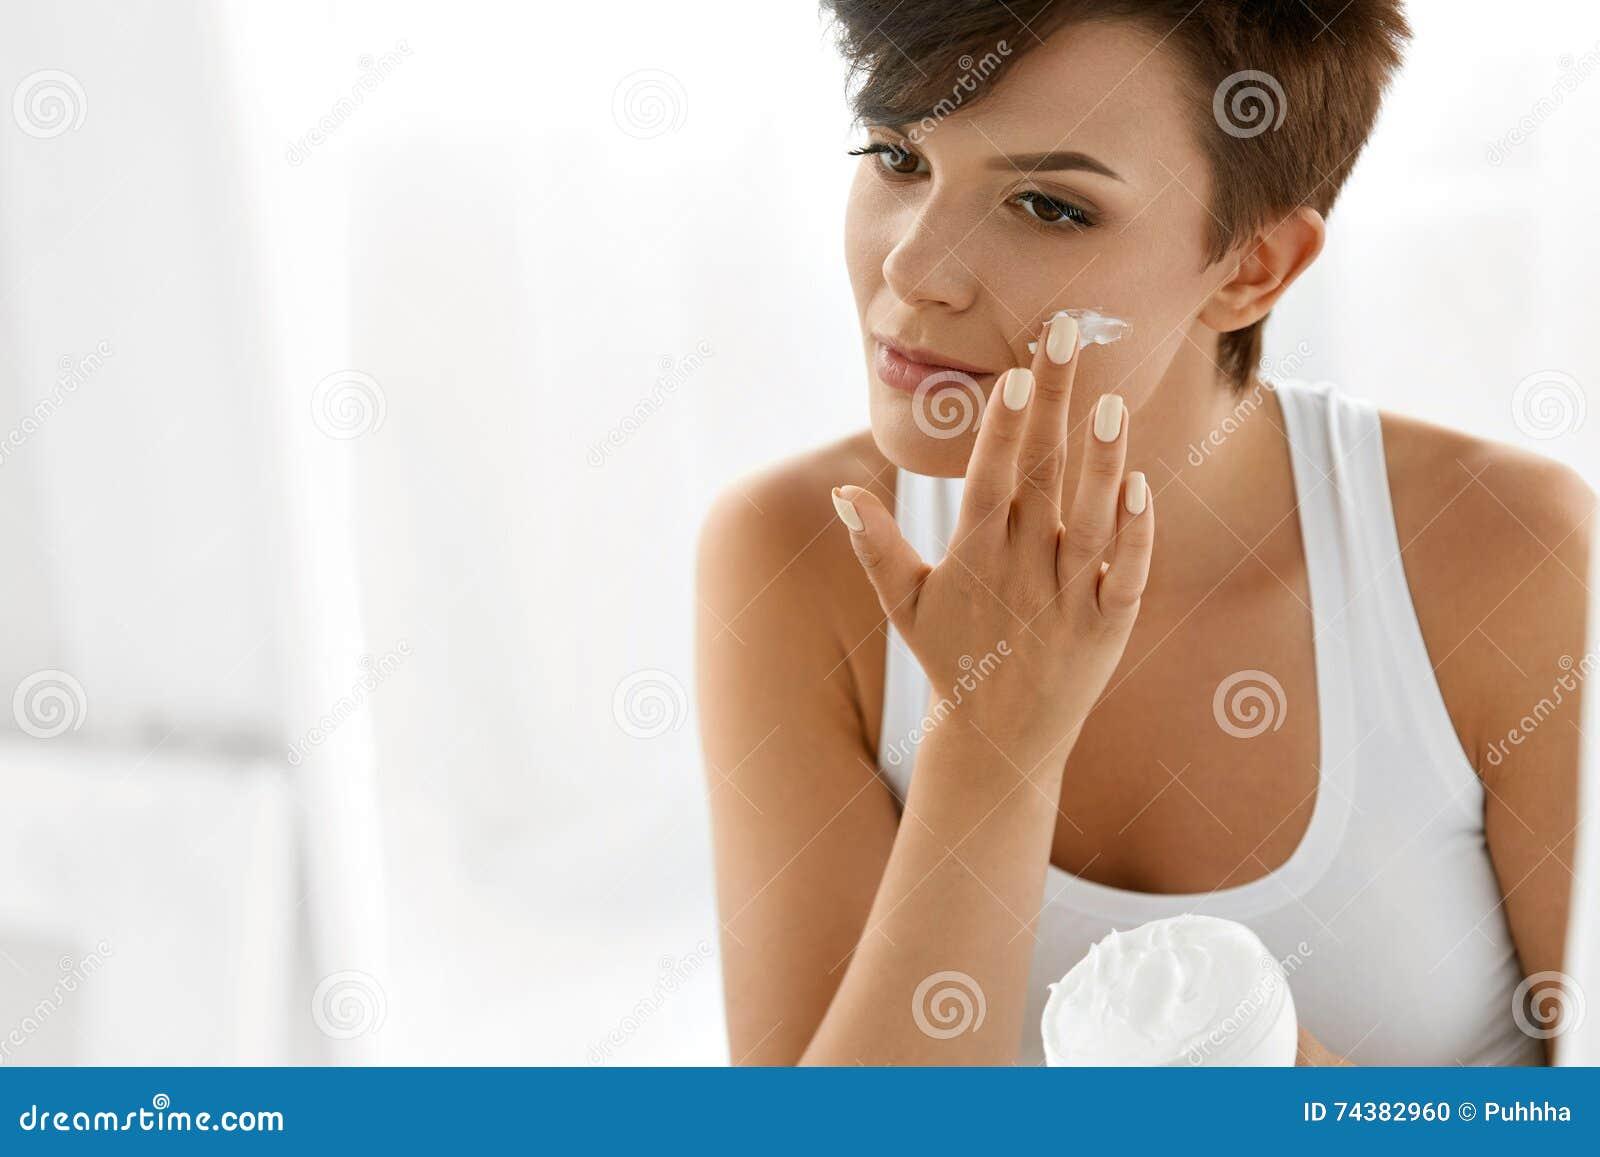 Beauty Skin Care. Beautiful Woman Applying Cosmetic Face Cream